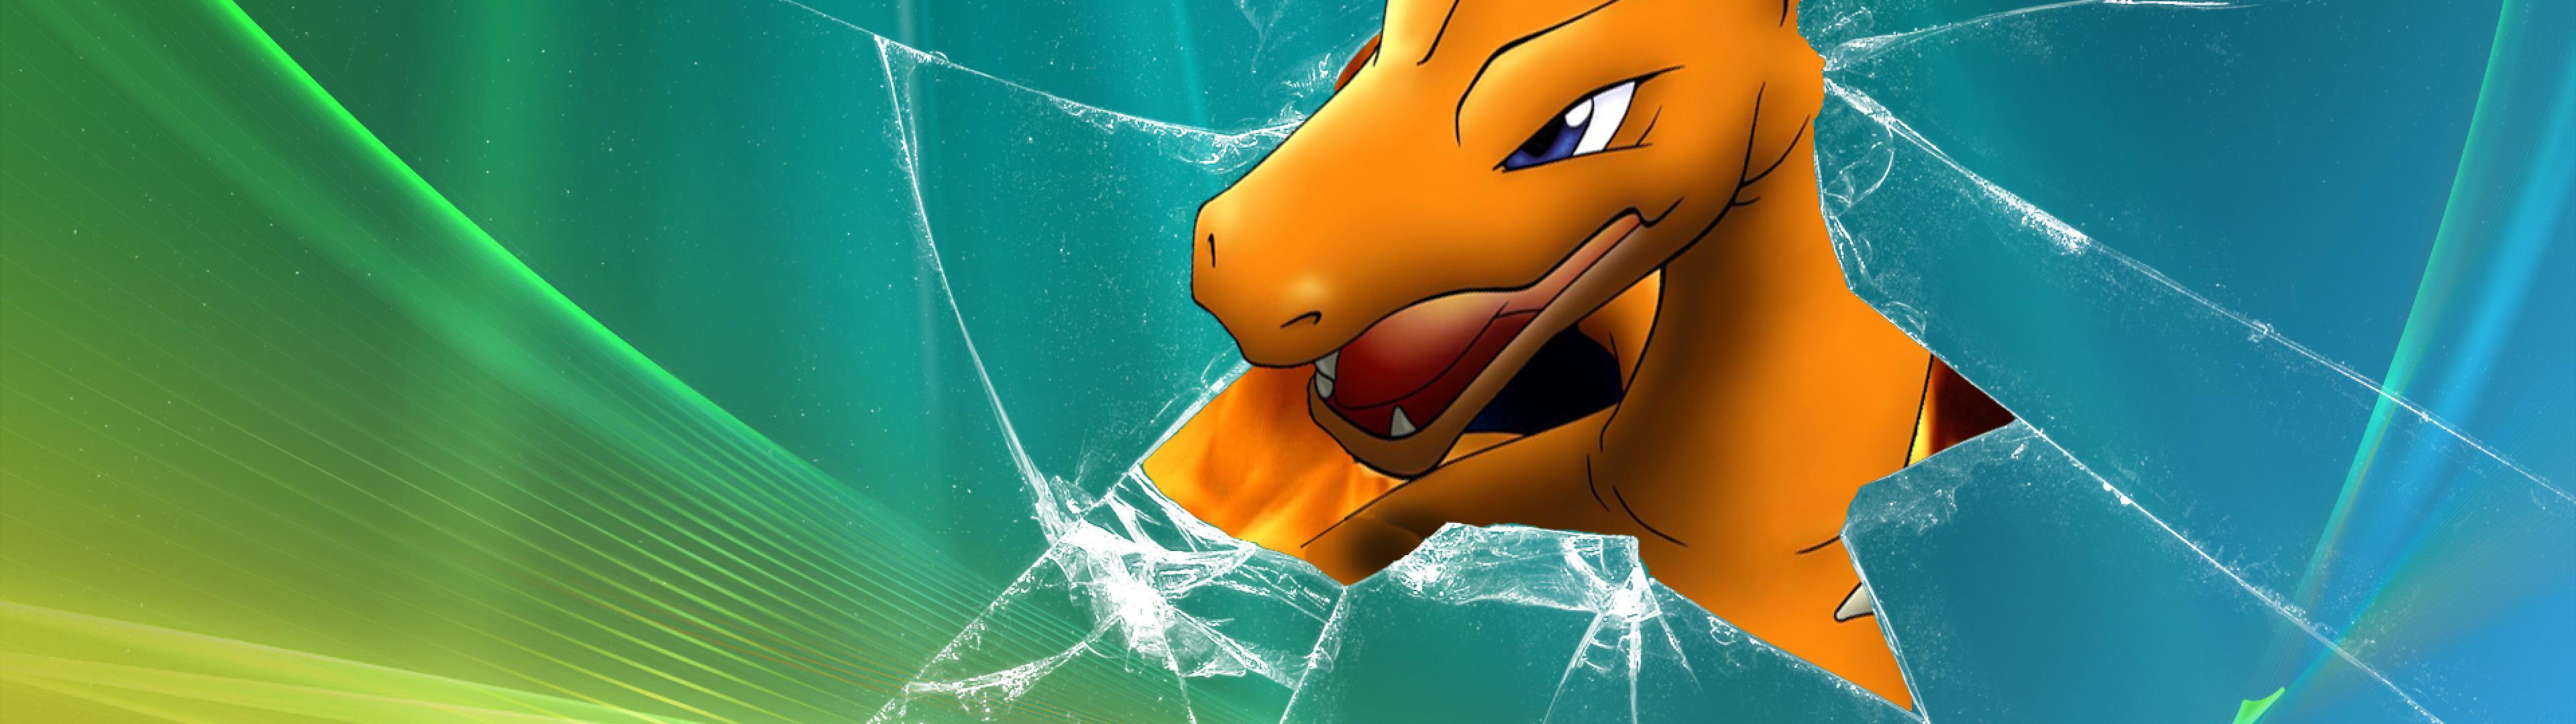 pokemon vista broken screen charizard desktop 1920x1080 wallpaper 3840x1080